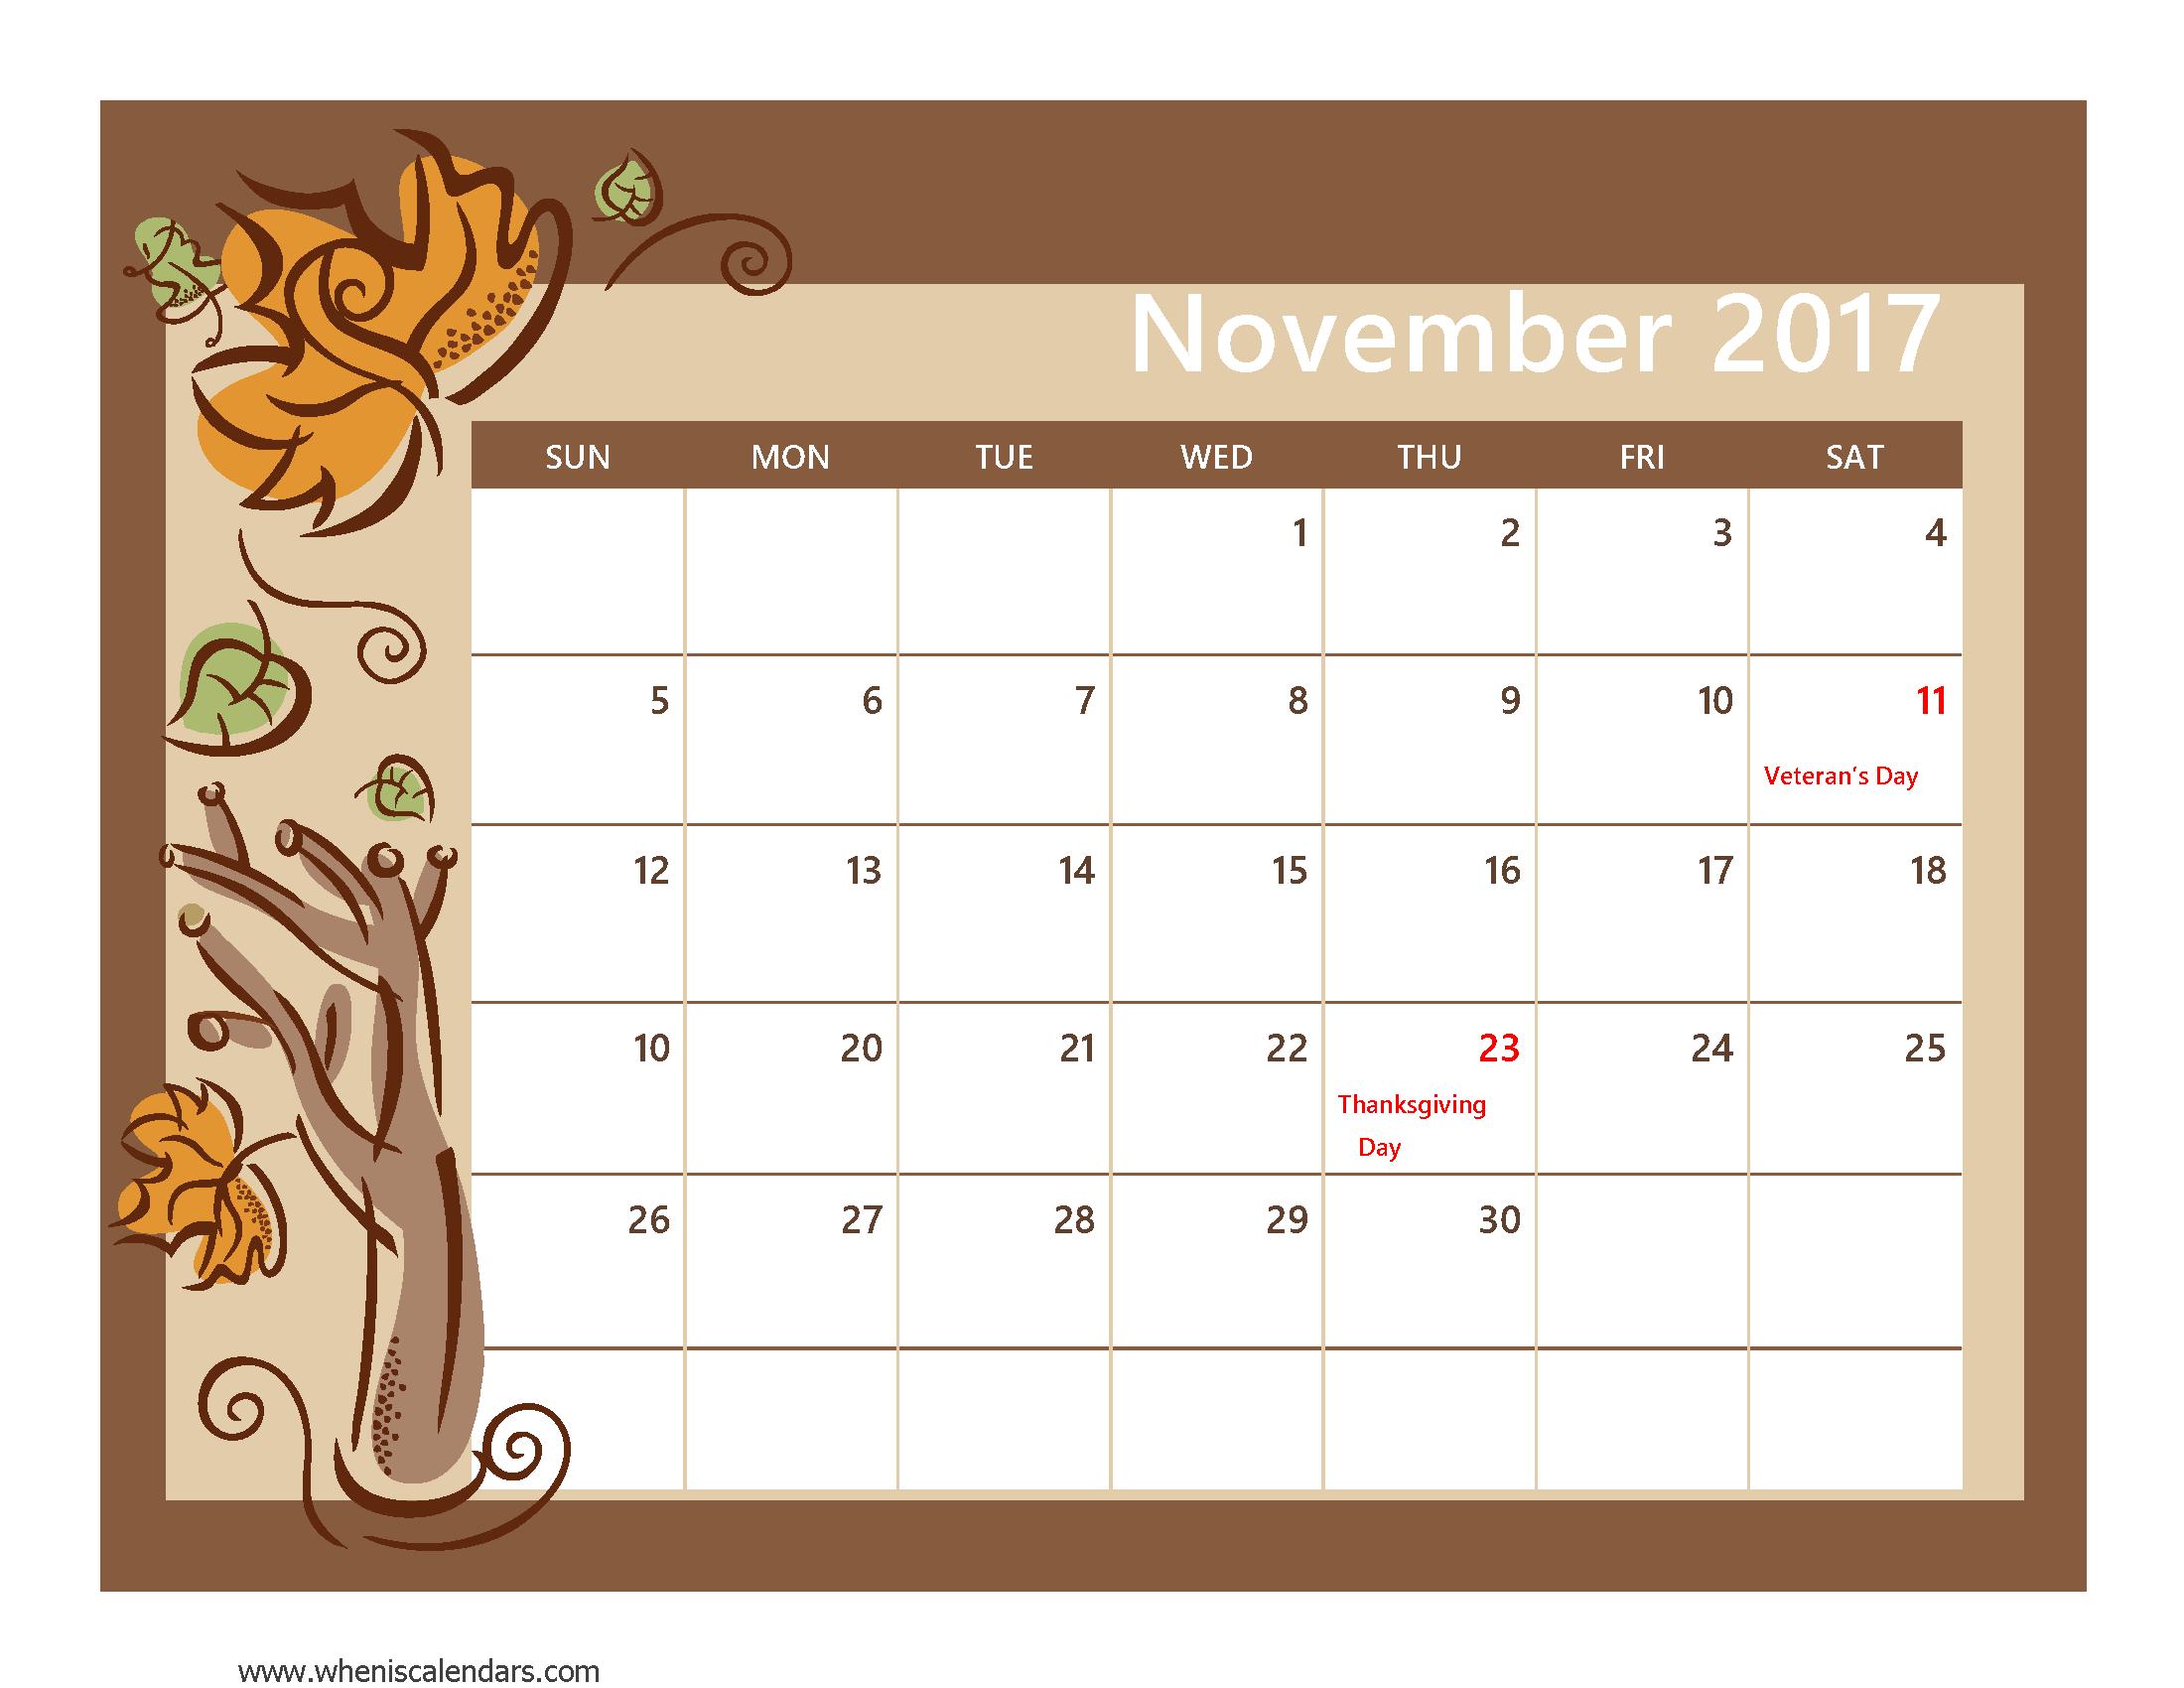 November 2017 Calendar With Holidays Uk | yearly calendar template